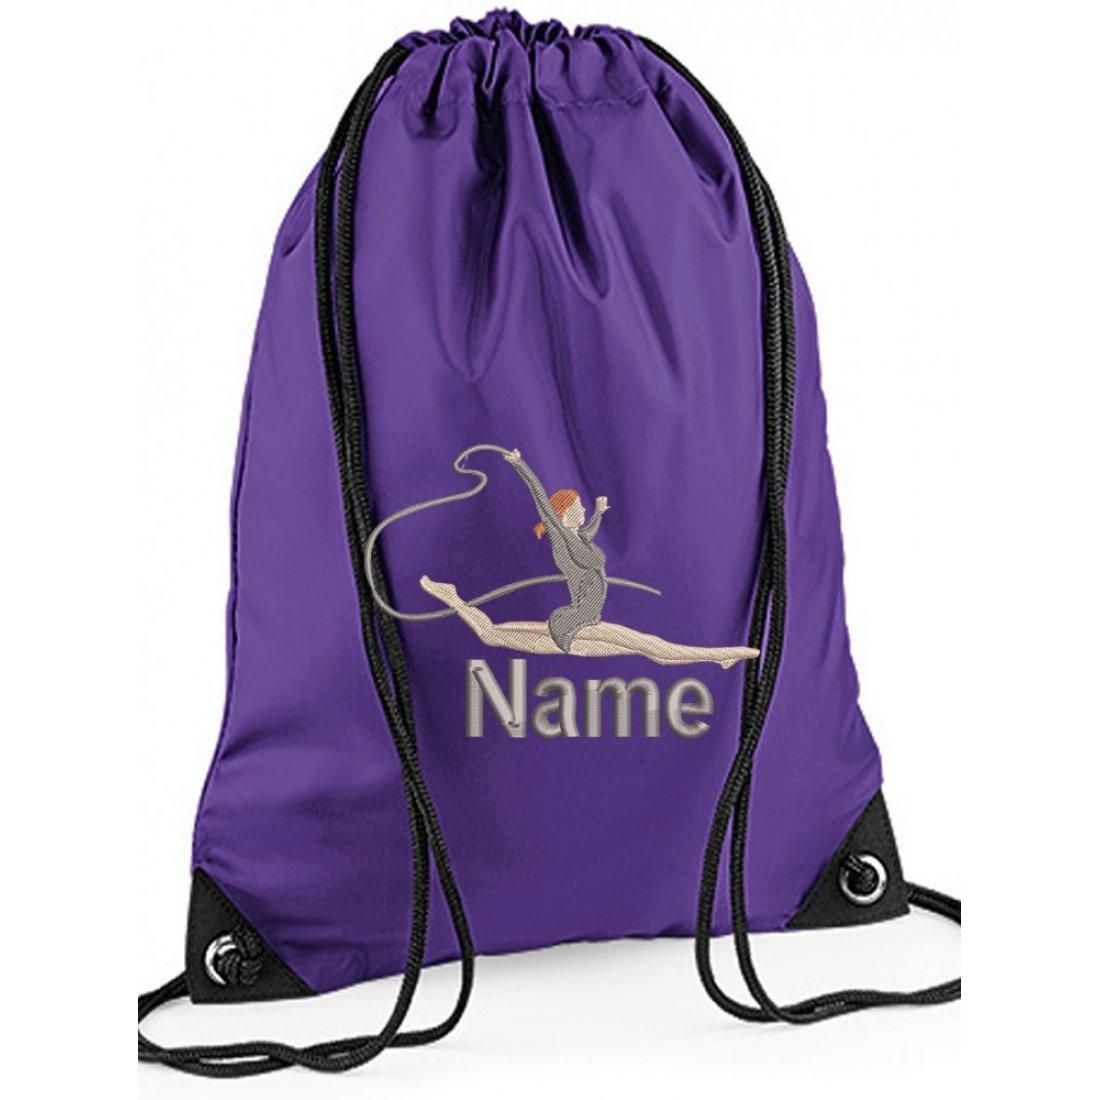 Personalised Embroidered Gymnastics Drawstring Gym Bag